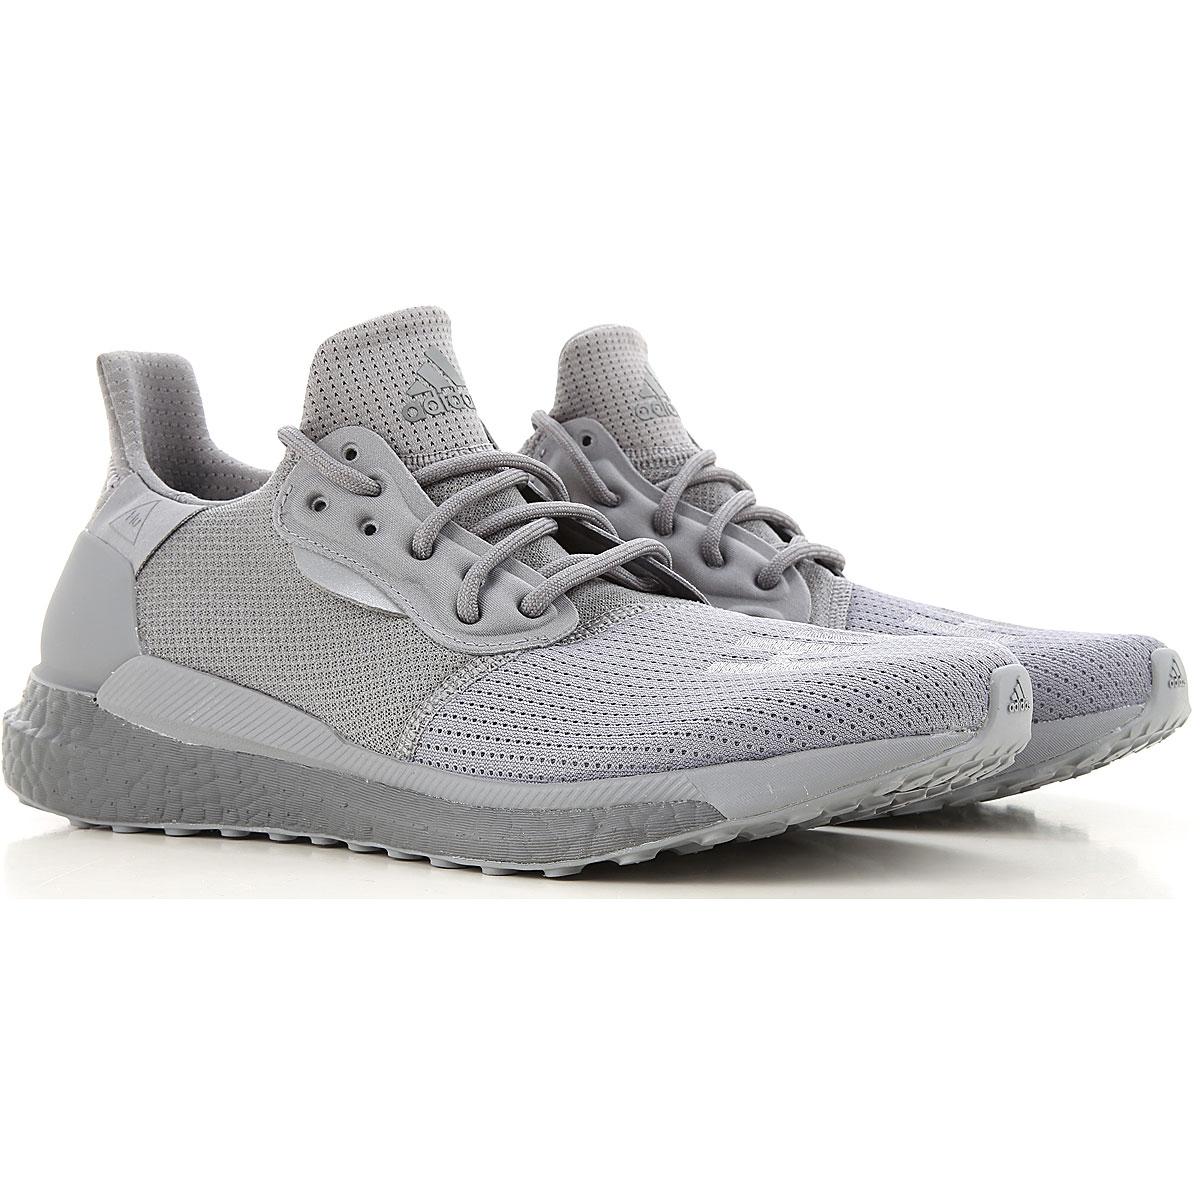 Adidas Sneakers for Men, Grey, Textile, 2019, USA 8 UK 6 5 EU 39 JAPAN 250 USA 6 UK 4 5 EU 37 JAPAN 230 US 8.5 • UK 7 • EU 40 • J 255 •